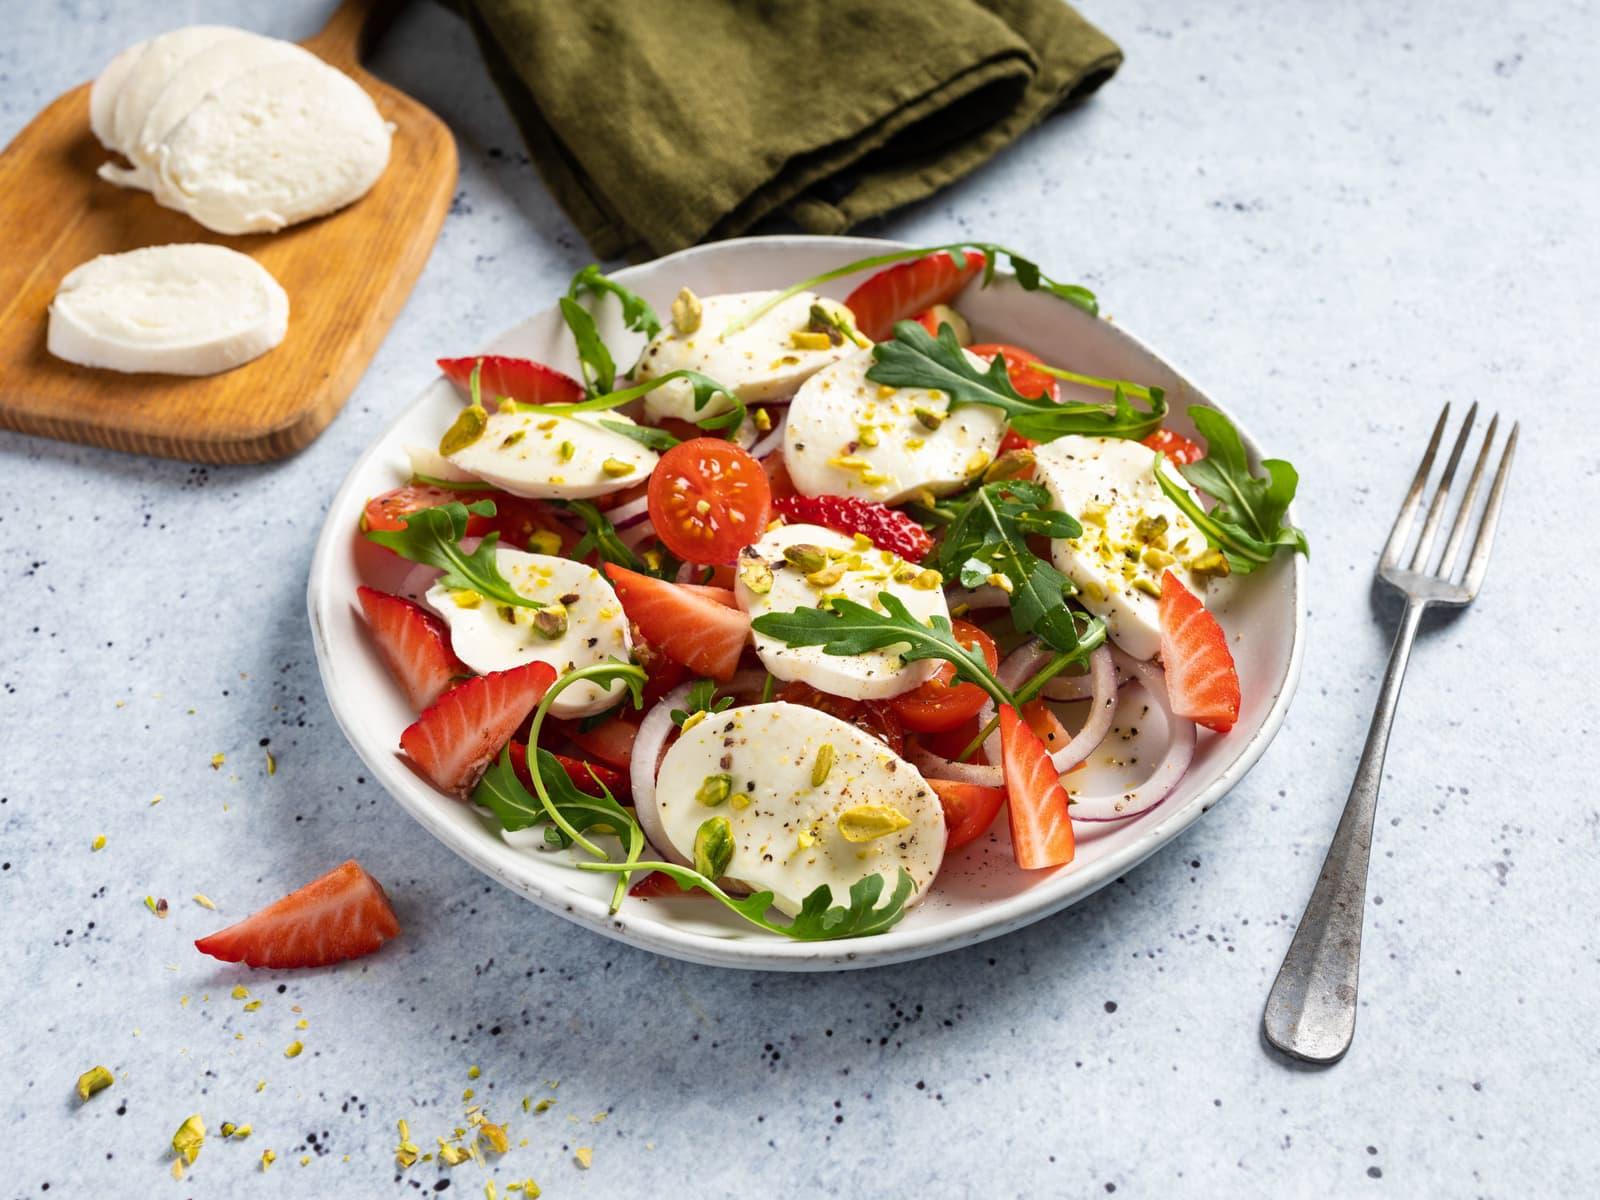 Mozzarellasalat med jordbær og nøtter